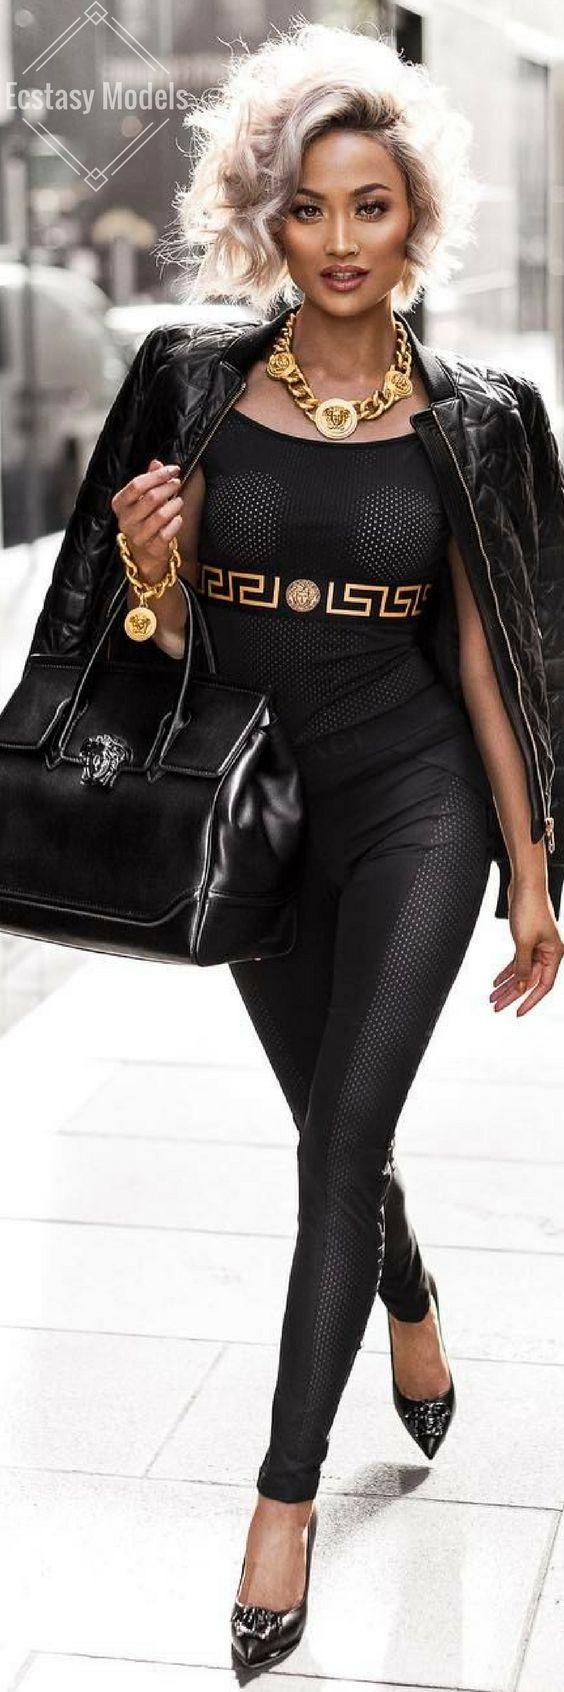 Versace Slay // Fashion Look by Micah Gianneli: